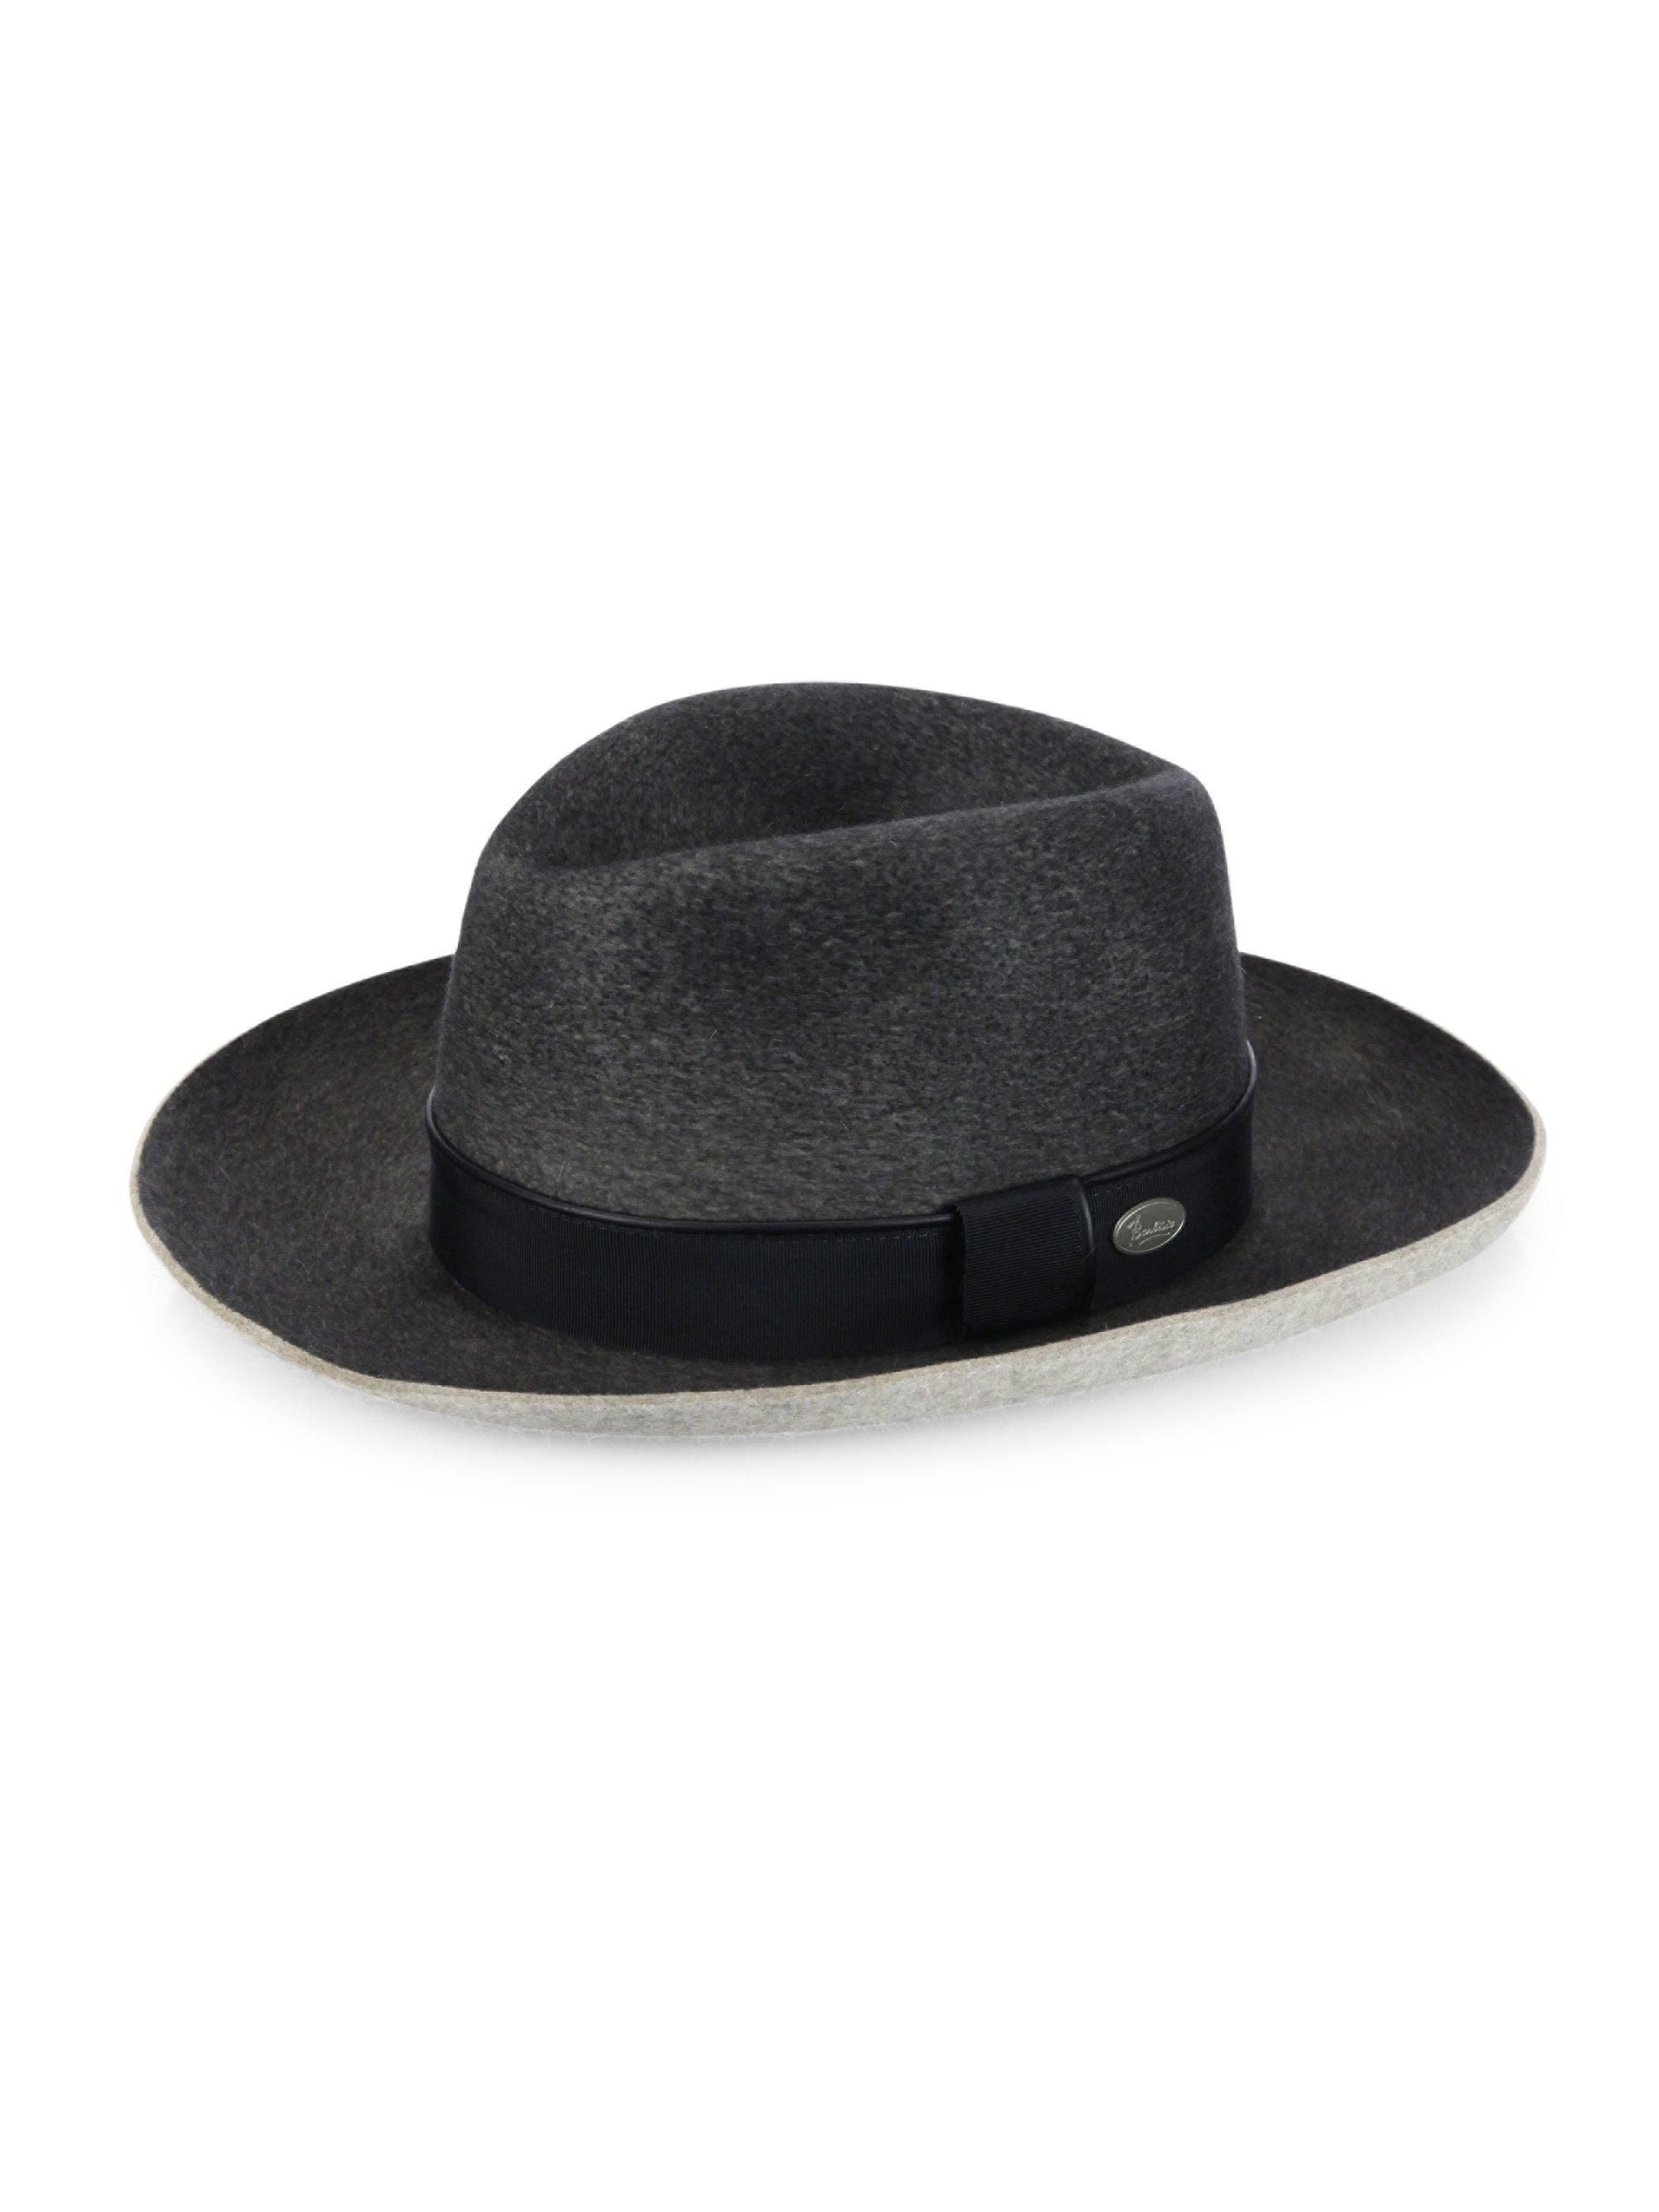 22d36efb7e7 Lyst - Barbisio Fedora Hat in Gray for Men